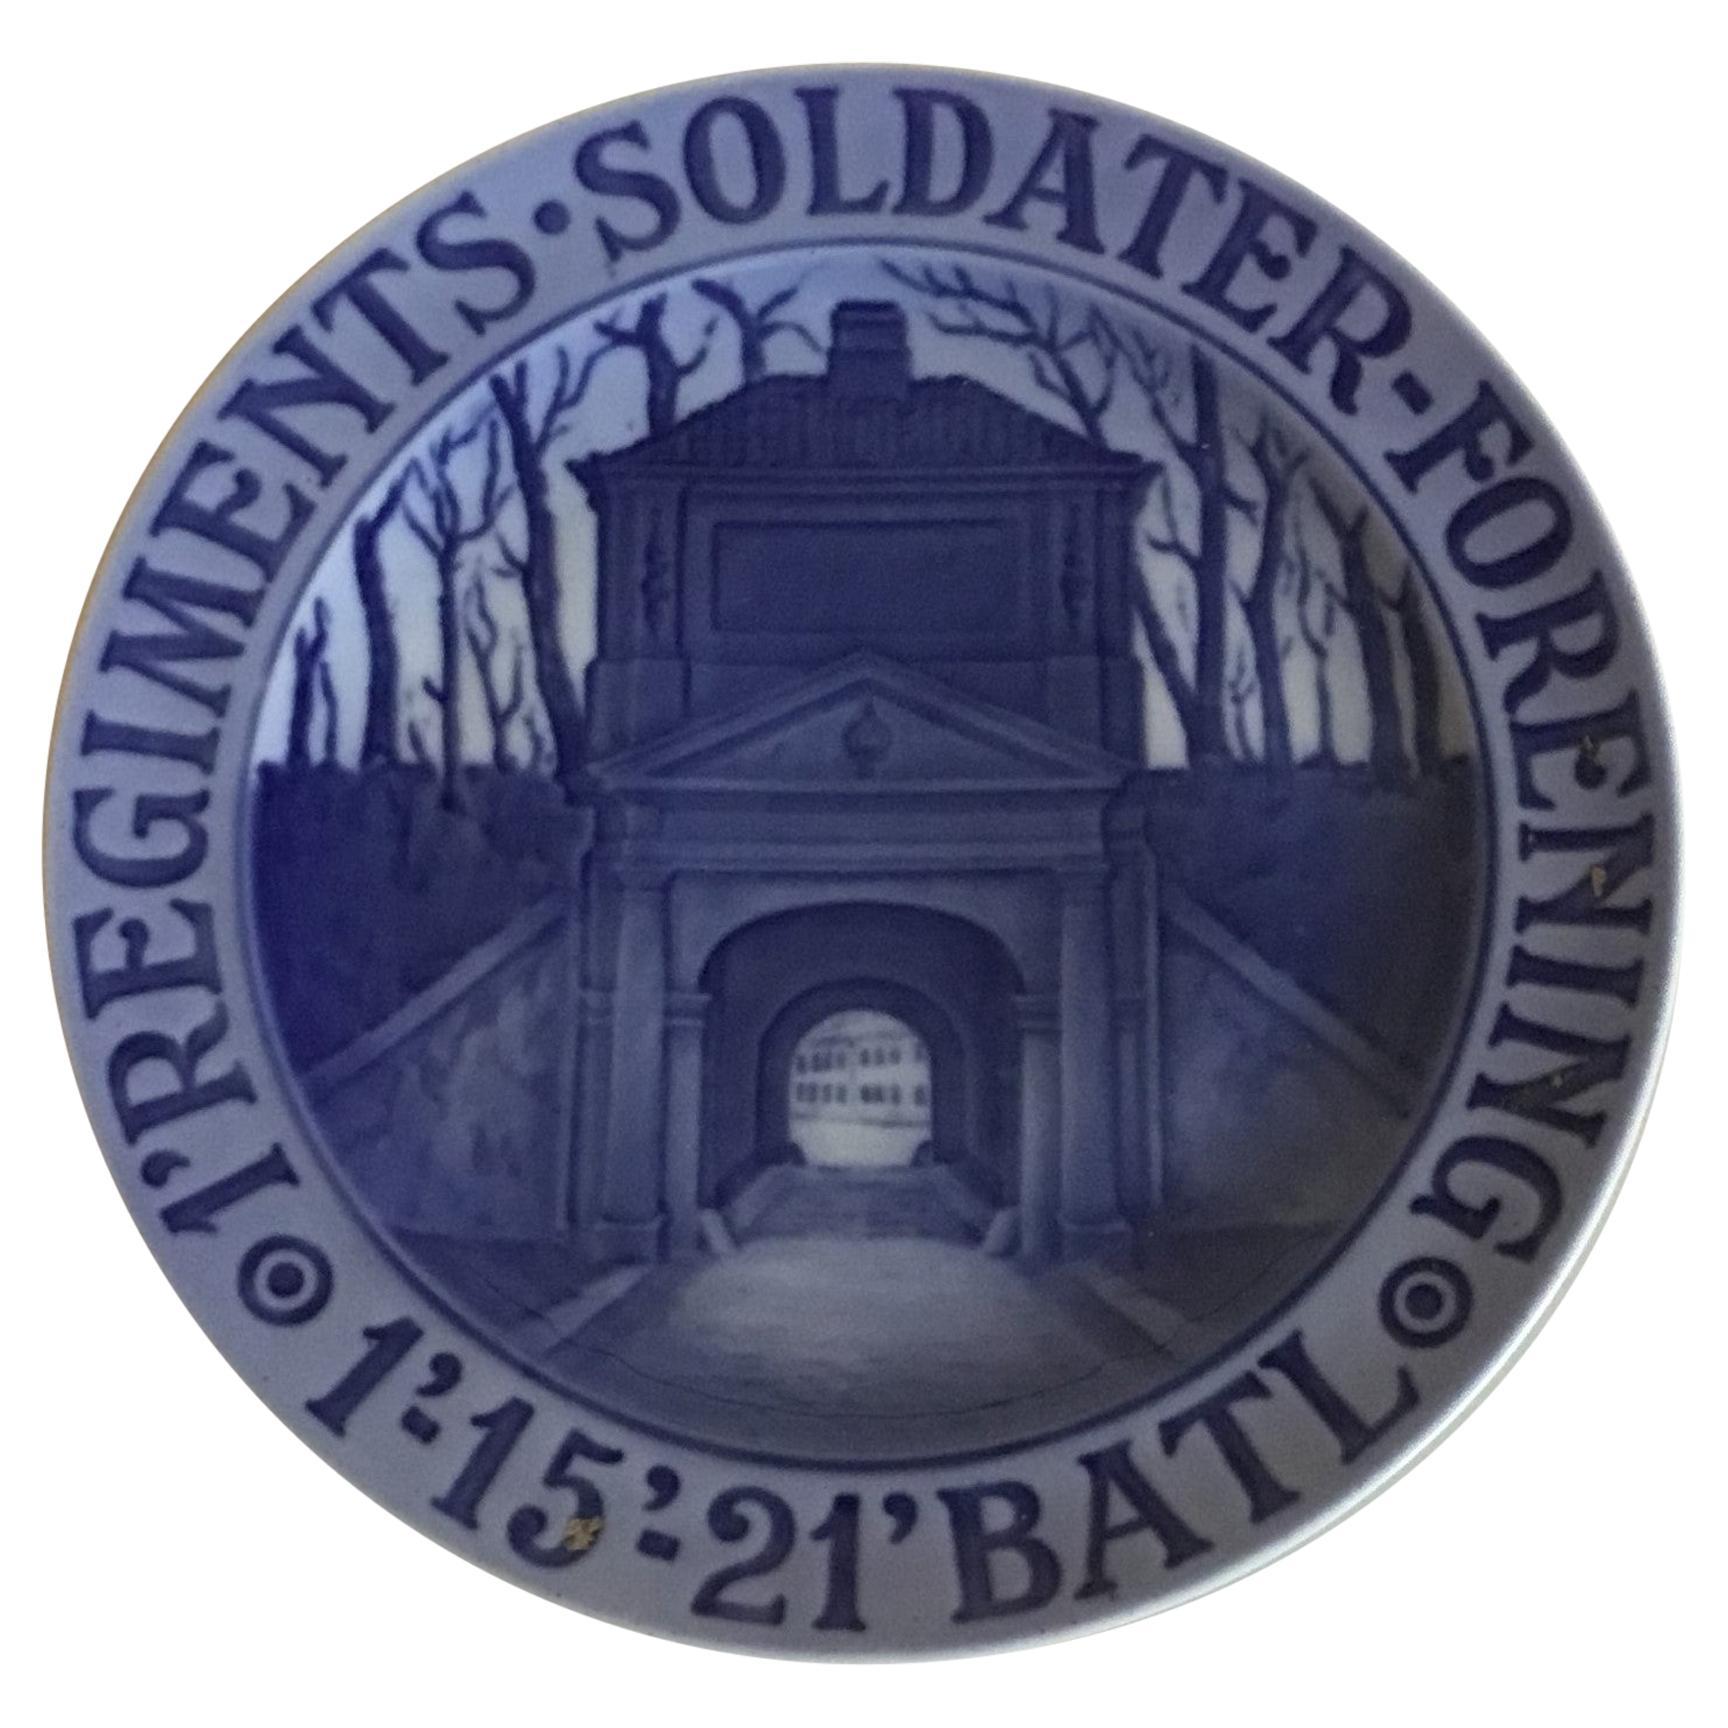 Royal Copenhagen Commemorative Plate from 1920 RC-CM196